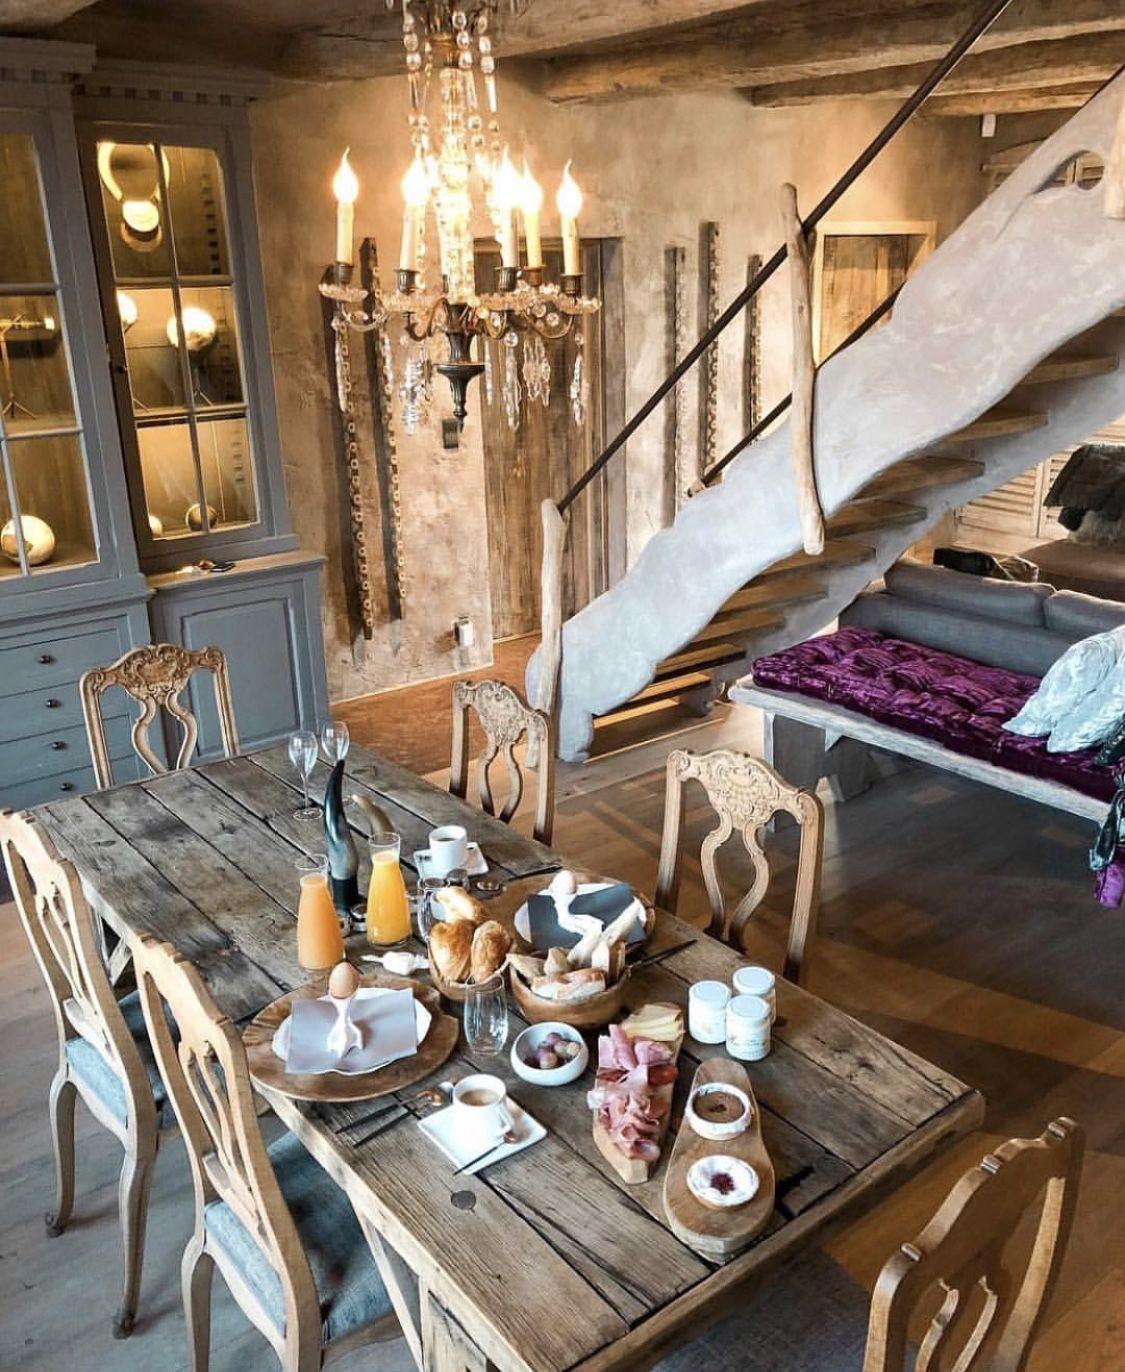 Breakfast Goals Ne5t Hotel Spa Collection Triptwin Namur Belgique Gite Idee